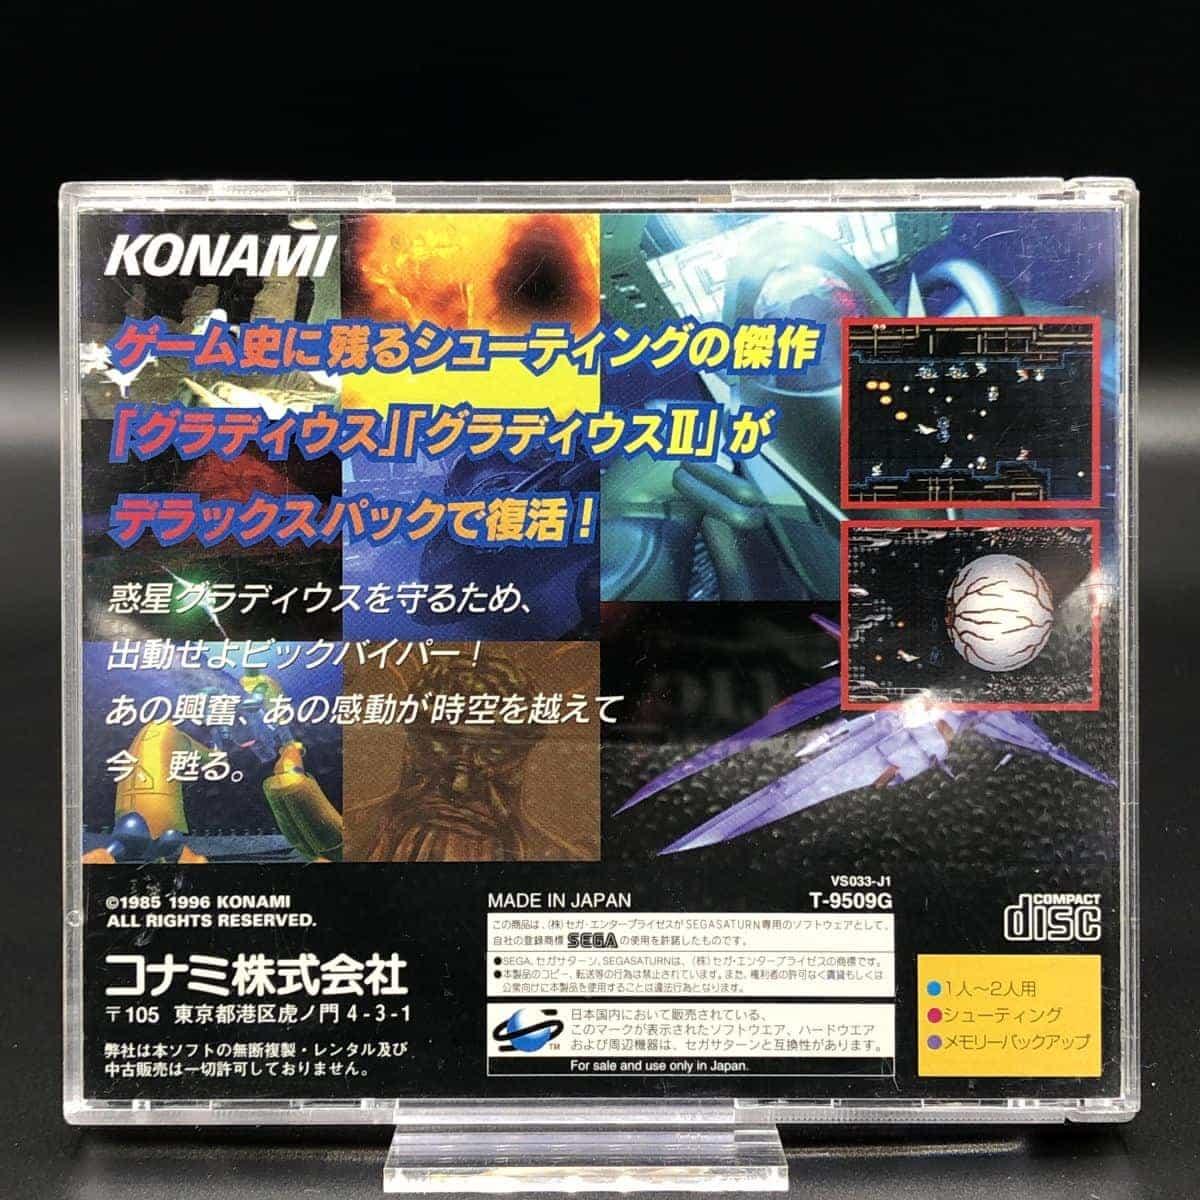 Gradius Deluxe Pack (Import) (Komplett mit Spine) (Sehr gut) Sega Saturn